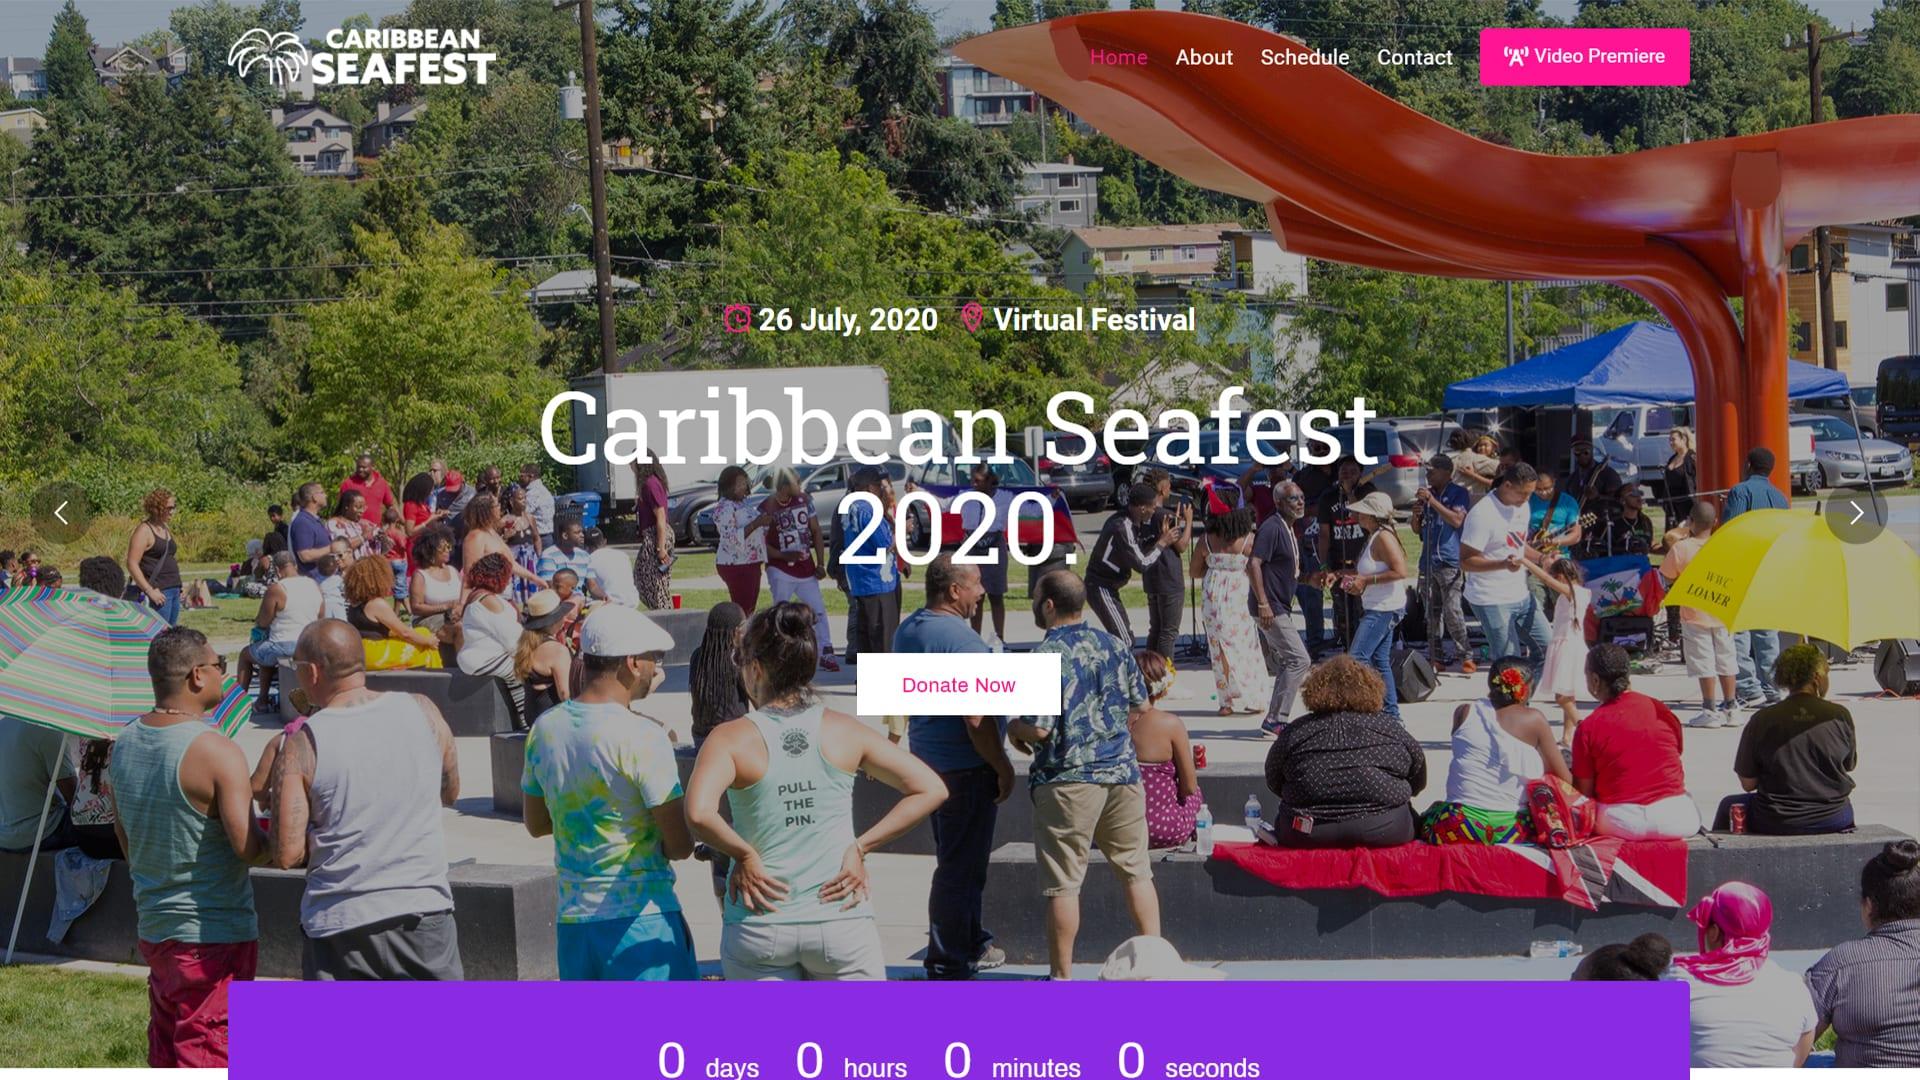 Caribbean Seafest